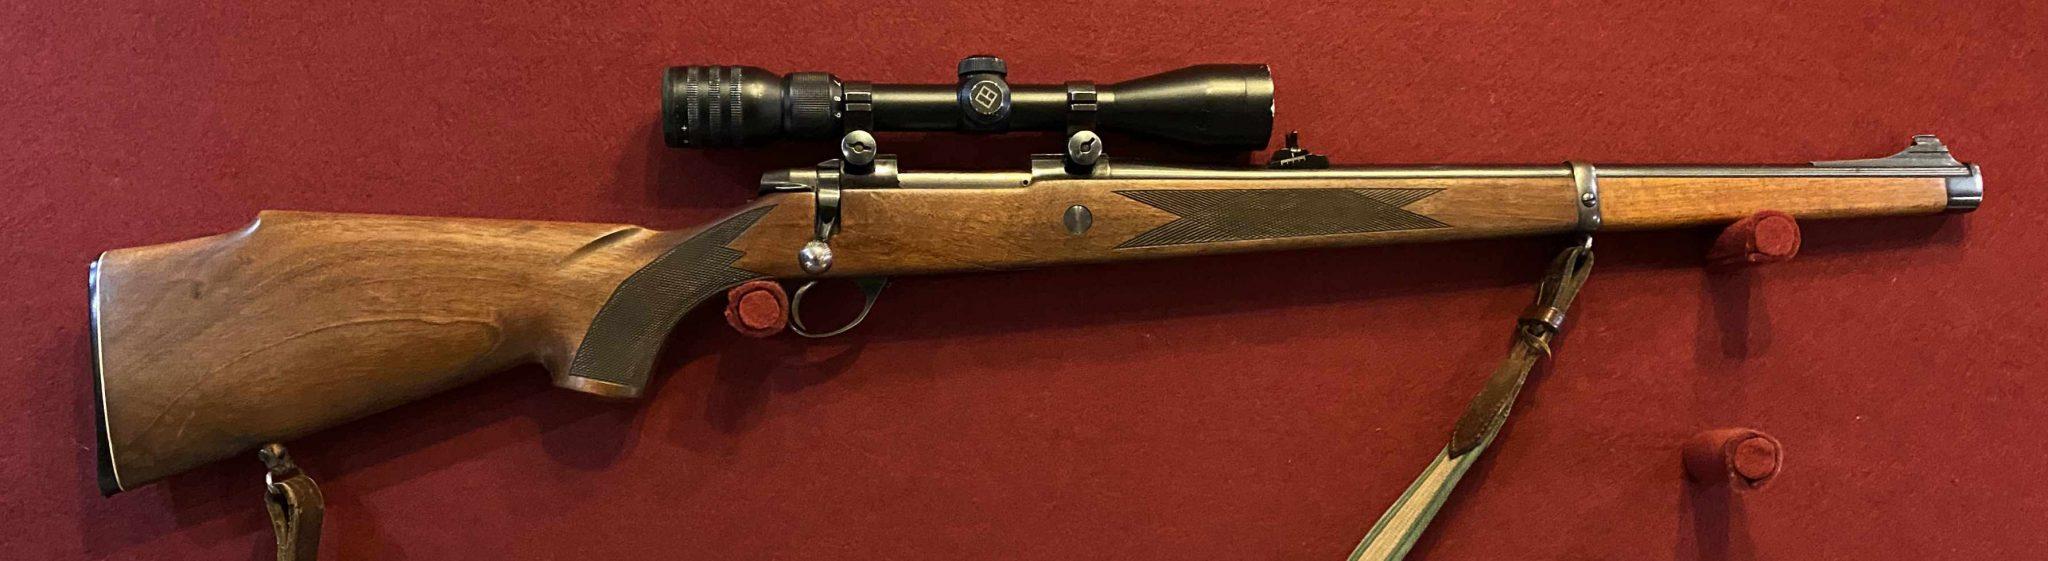 sako a2 308 rifle used